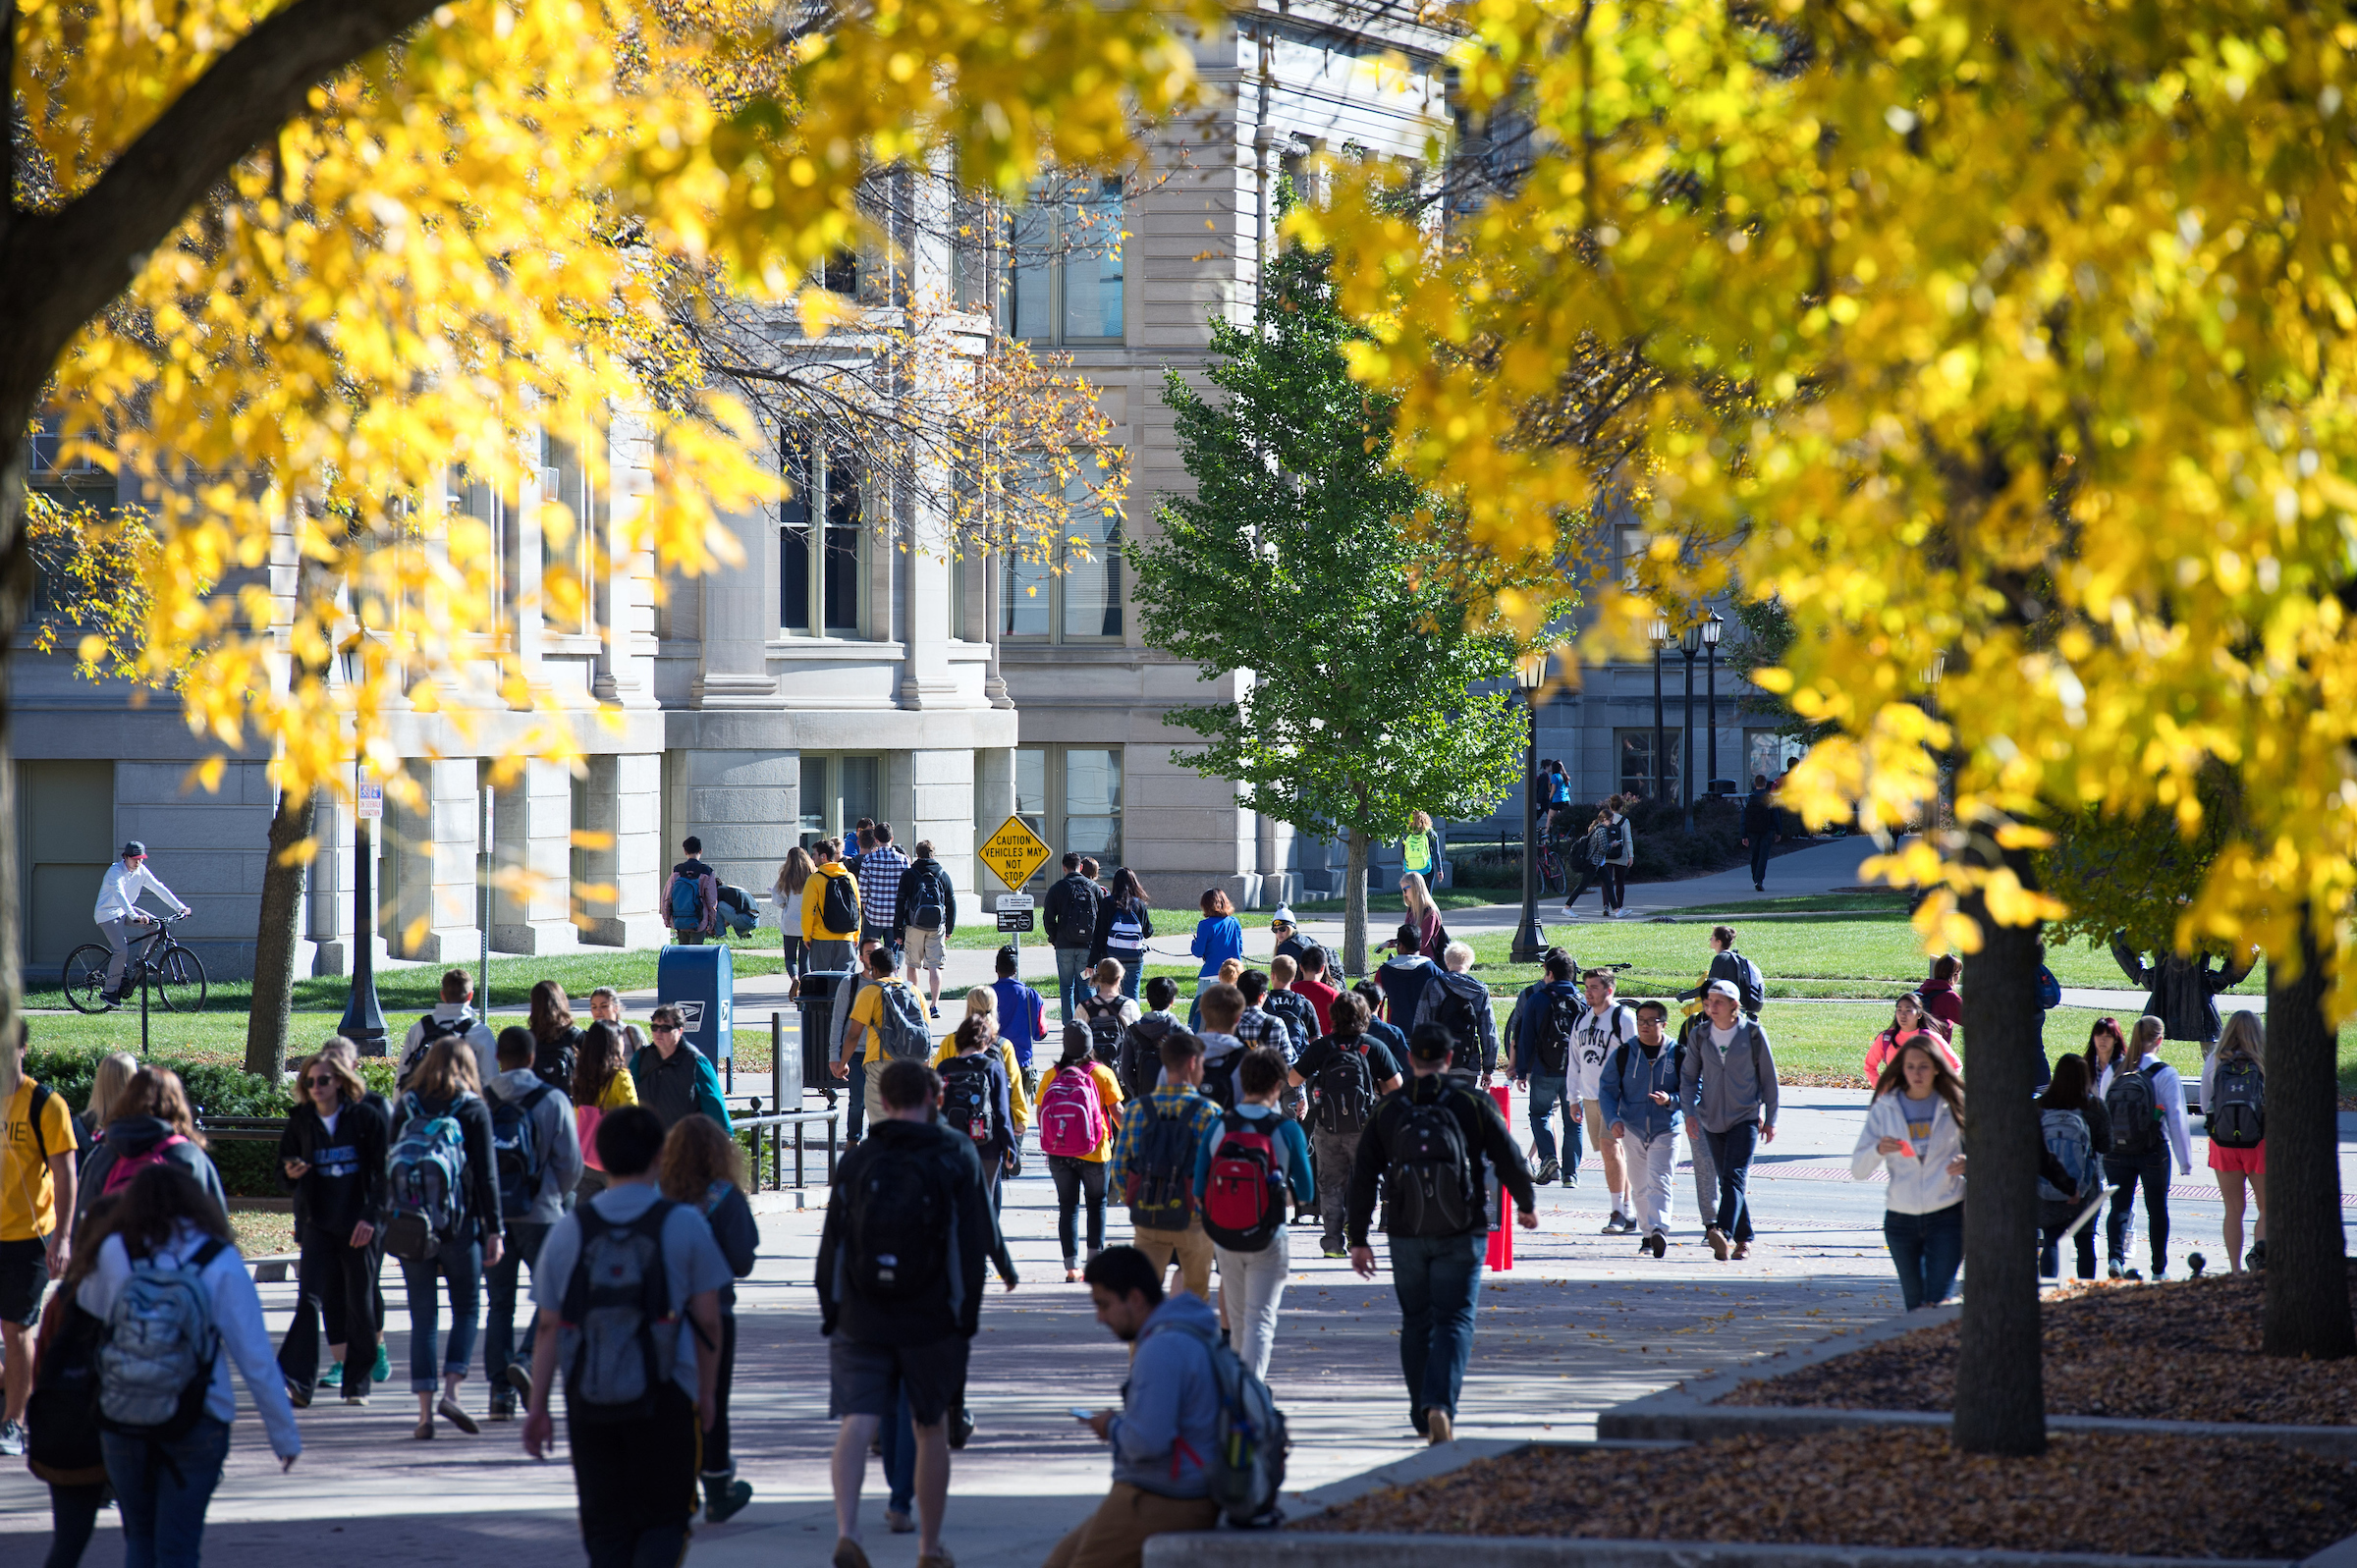 2015 10 14 fall day on campus jatorner 007